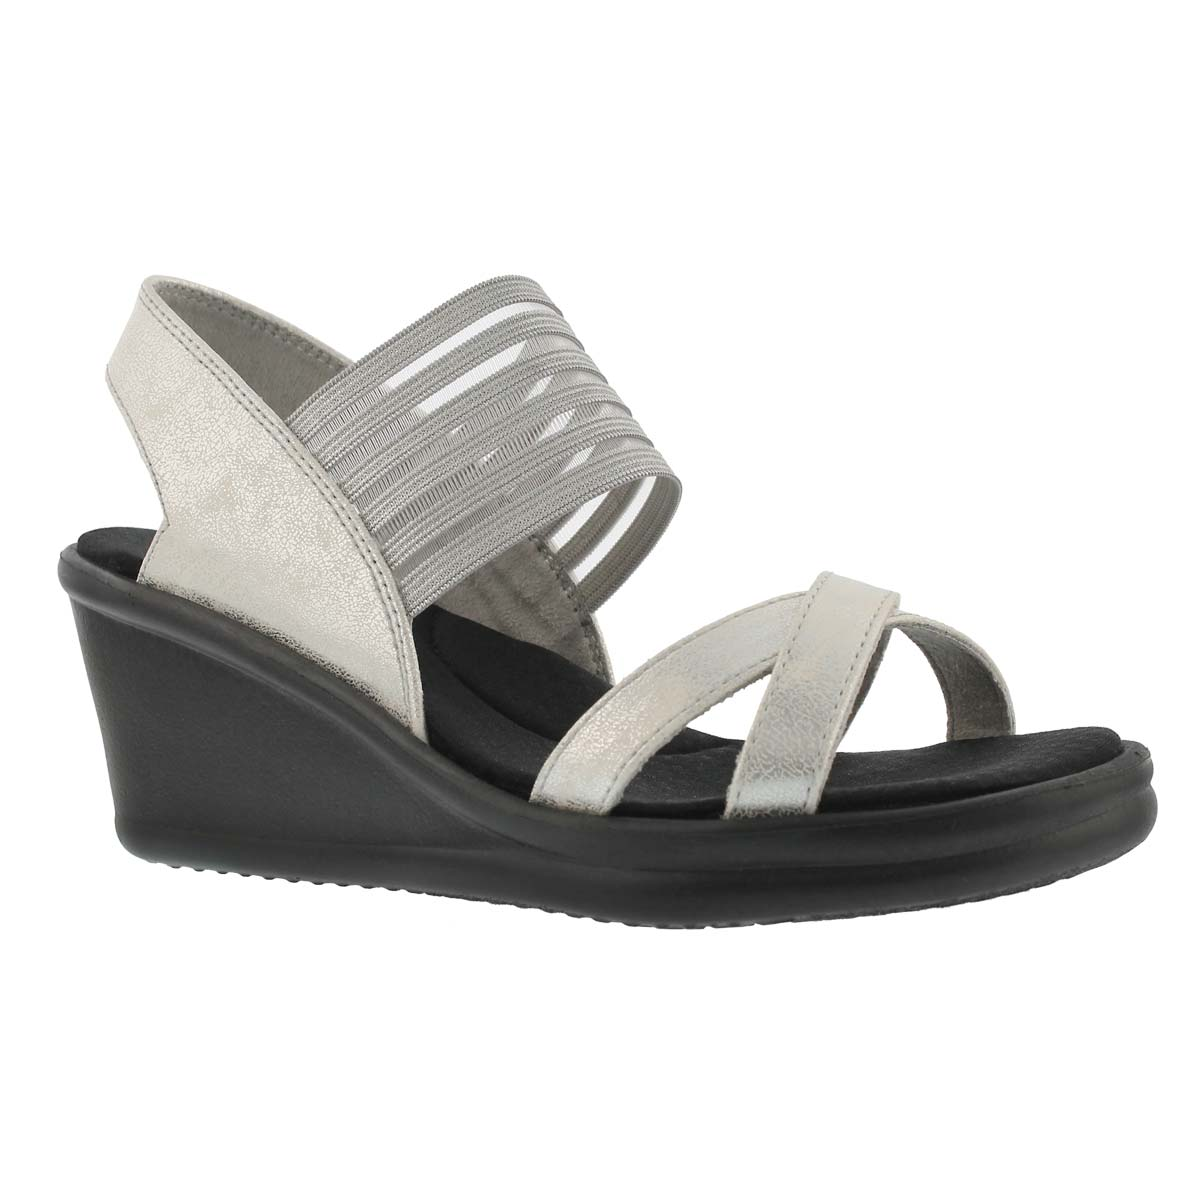 Women's RUMBLERS GLAM SOCIETY slvr wdg sandals